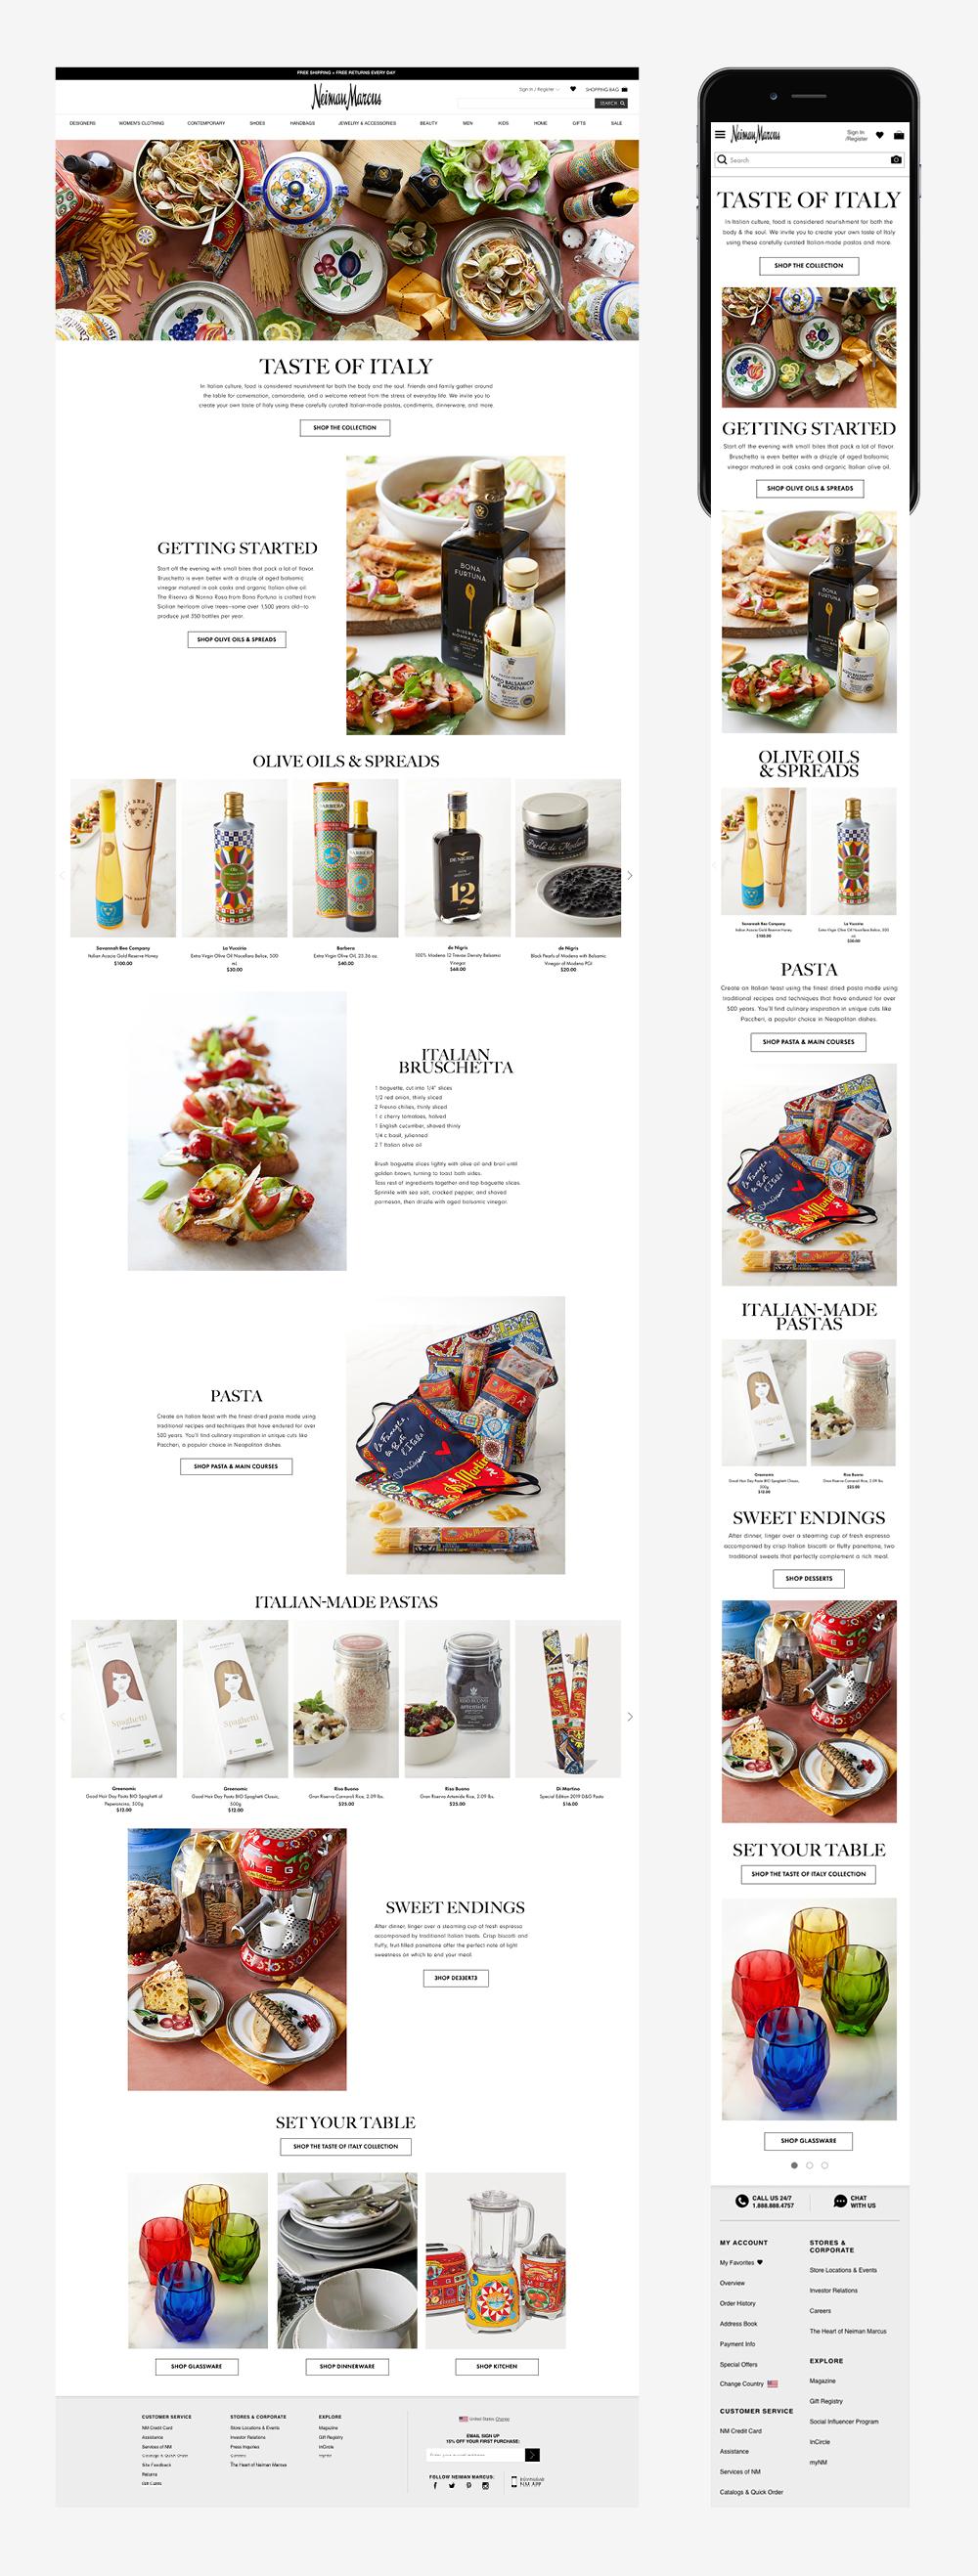 Taste of Italy, Gourmet/Epicure, Graphic Design, Jessica Oviedo